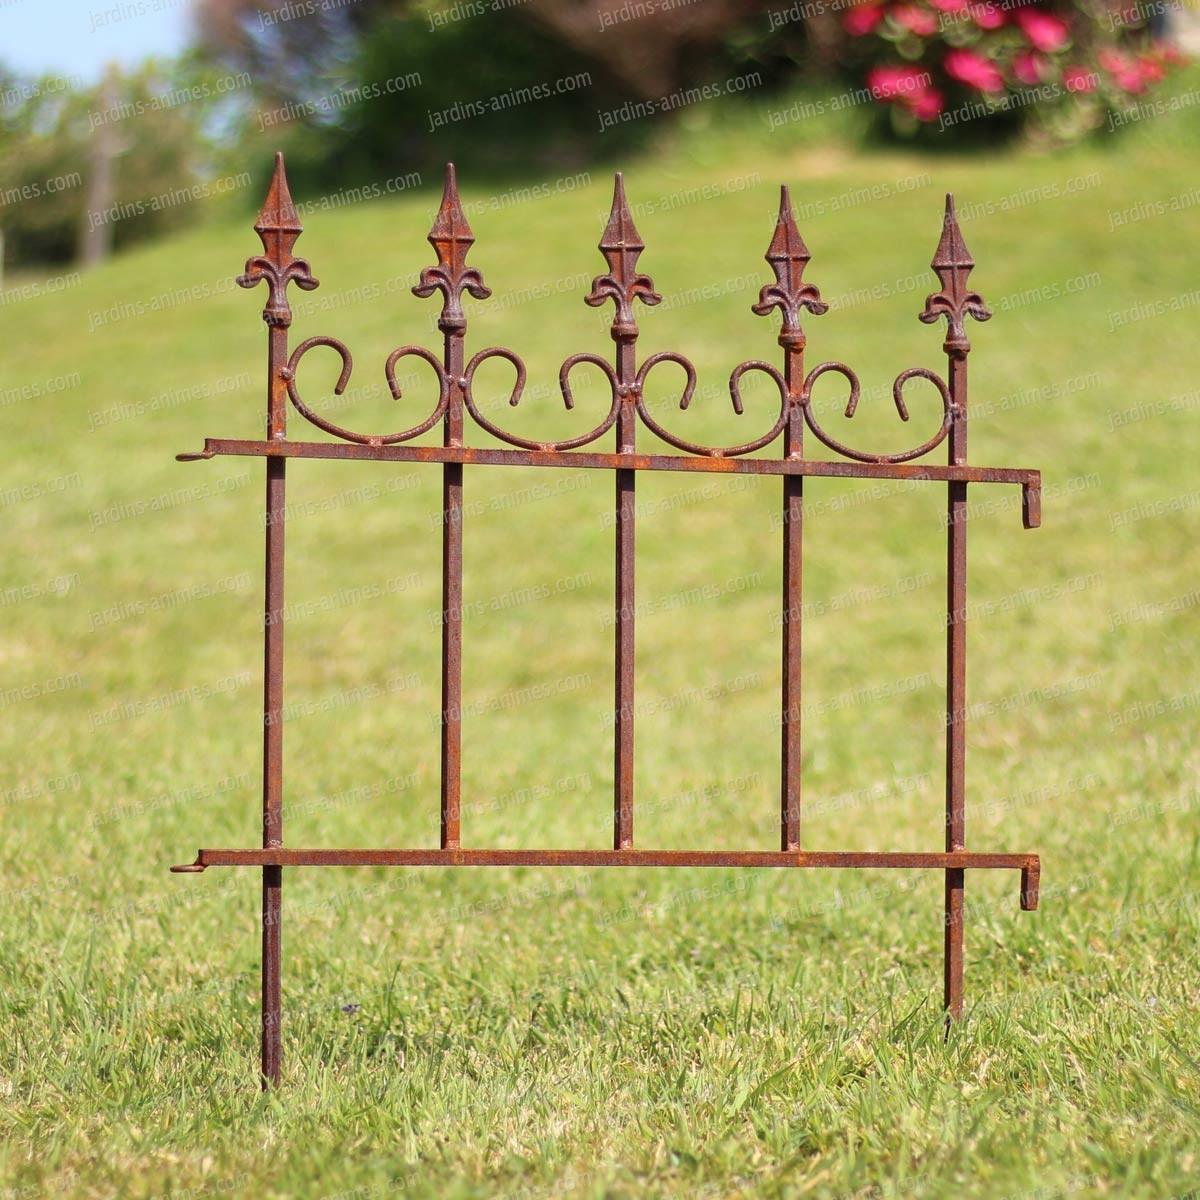 Bordure de jardin antique en m tal rouill long 66cm bordure de jardin - Bordure de jardin metal ...